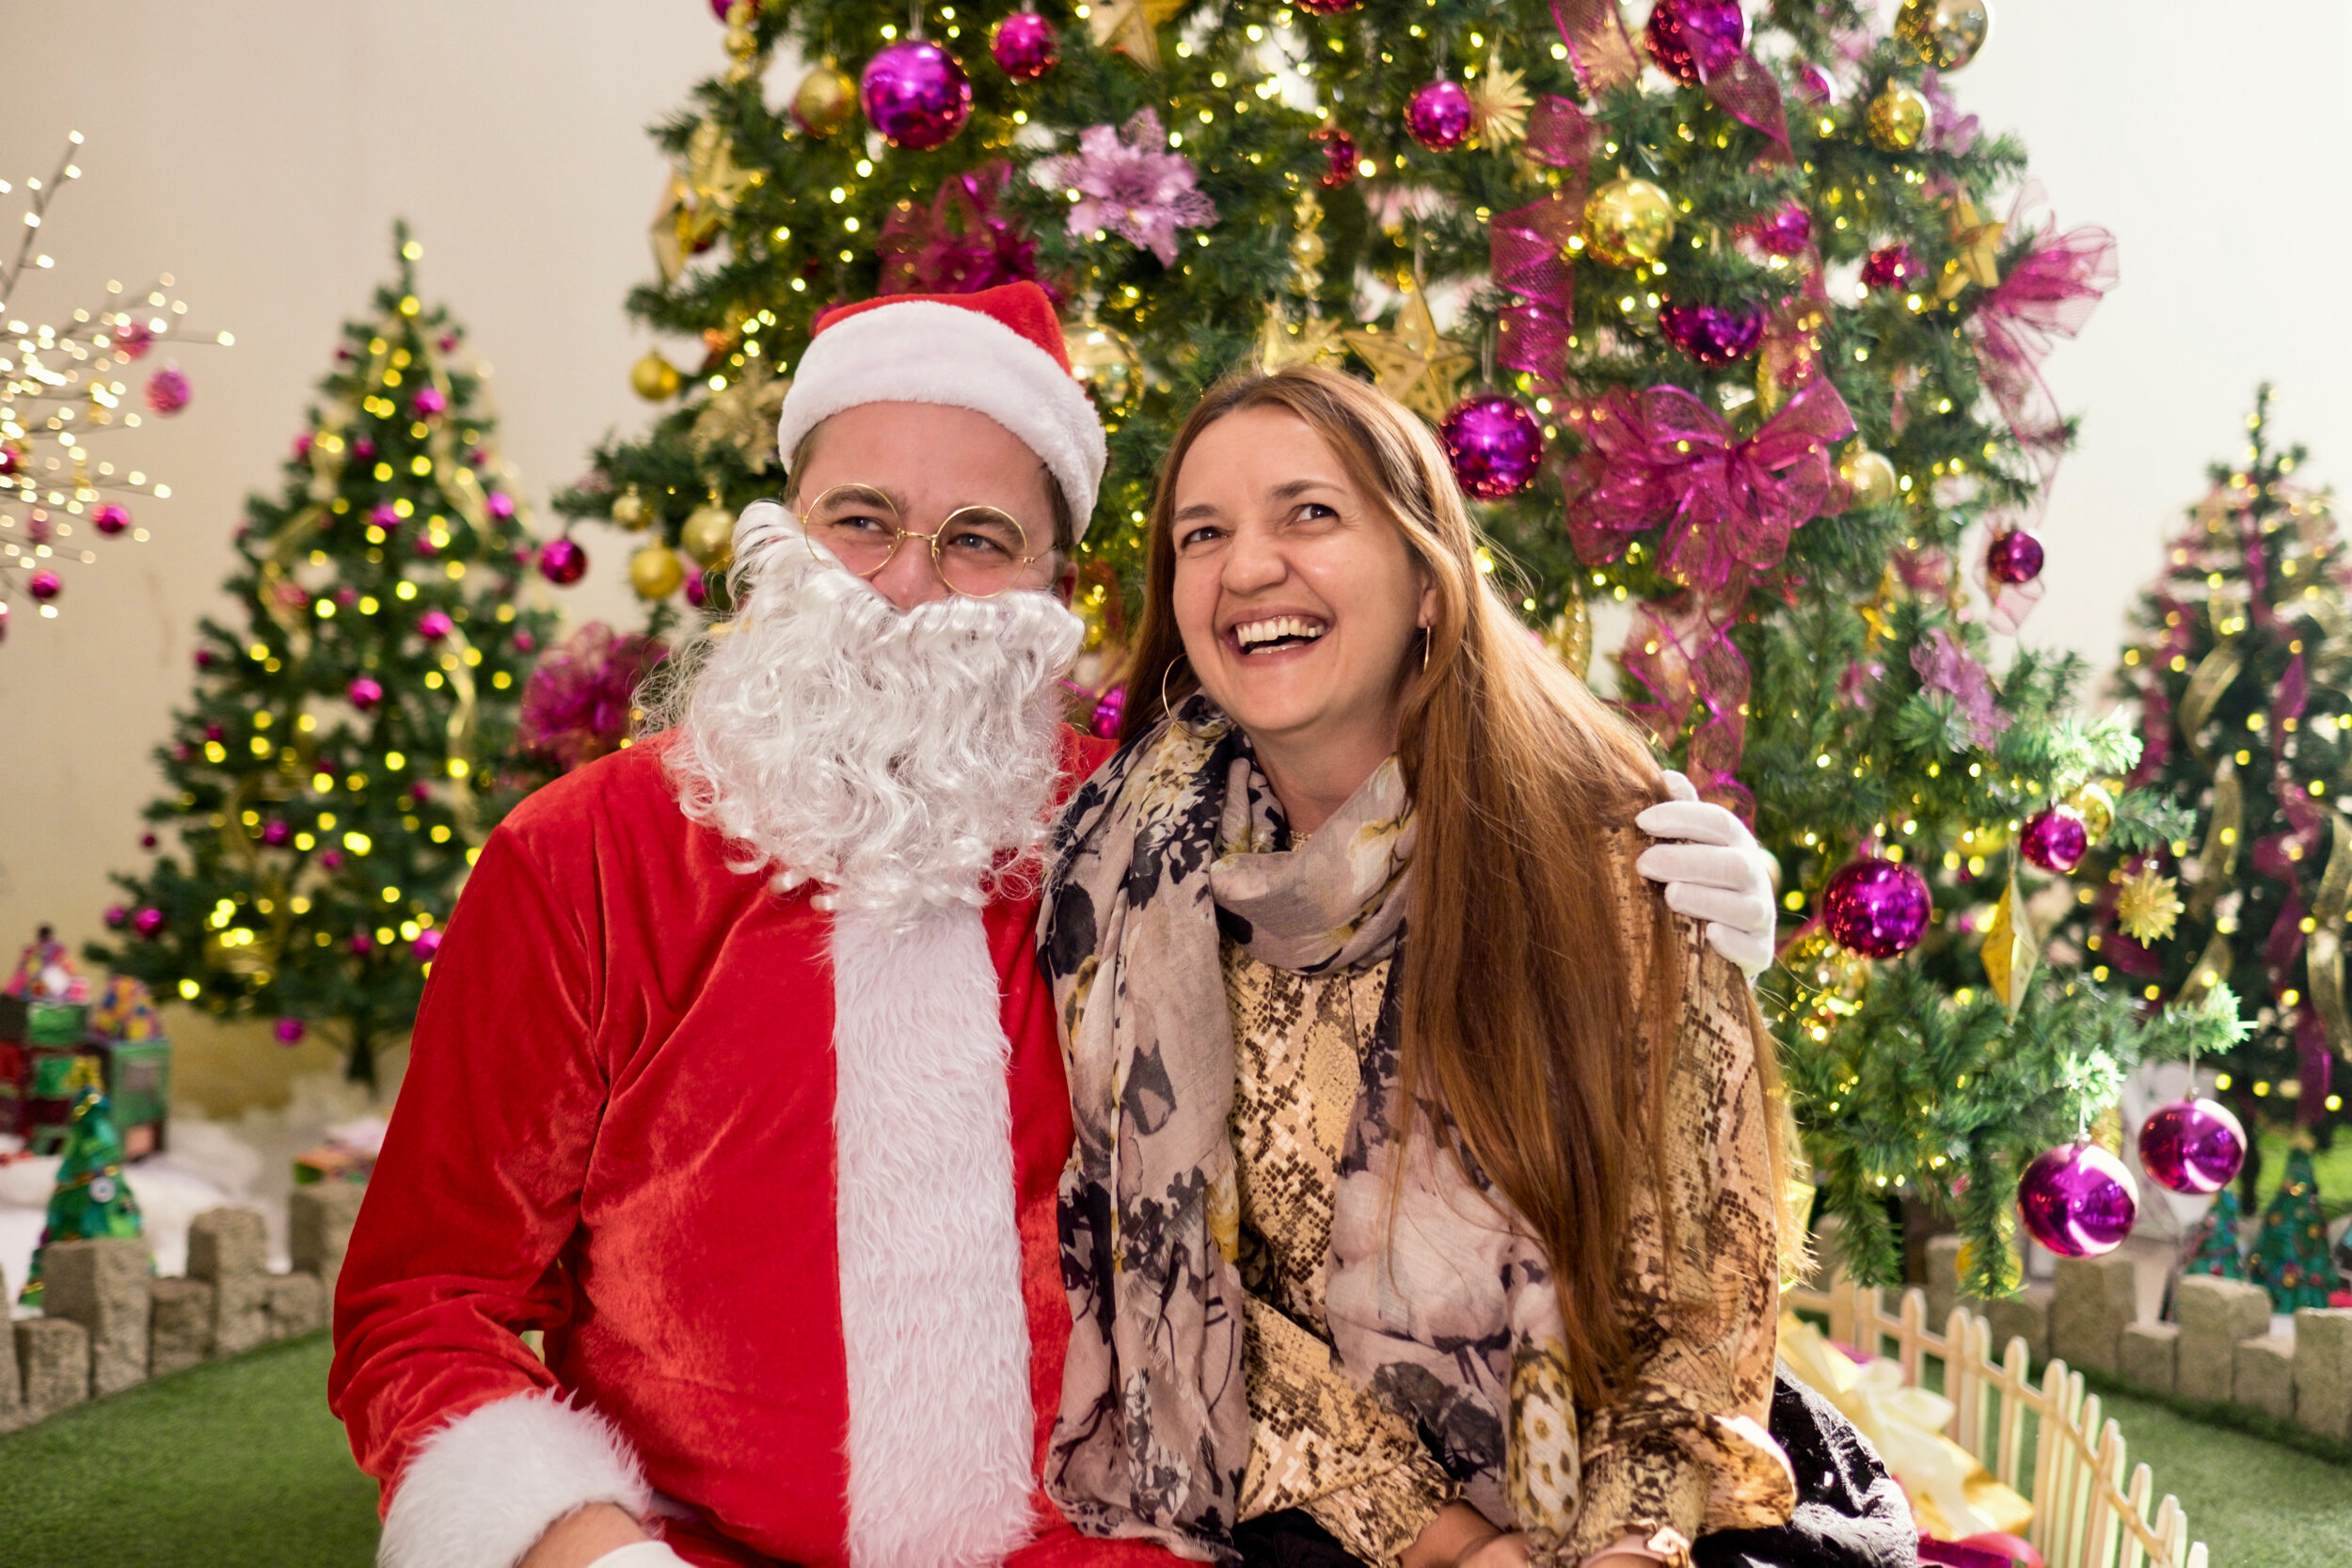 Photoshoot with Santa Clause-704.jpg